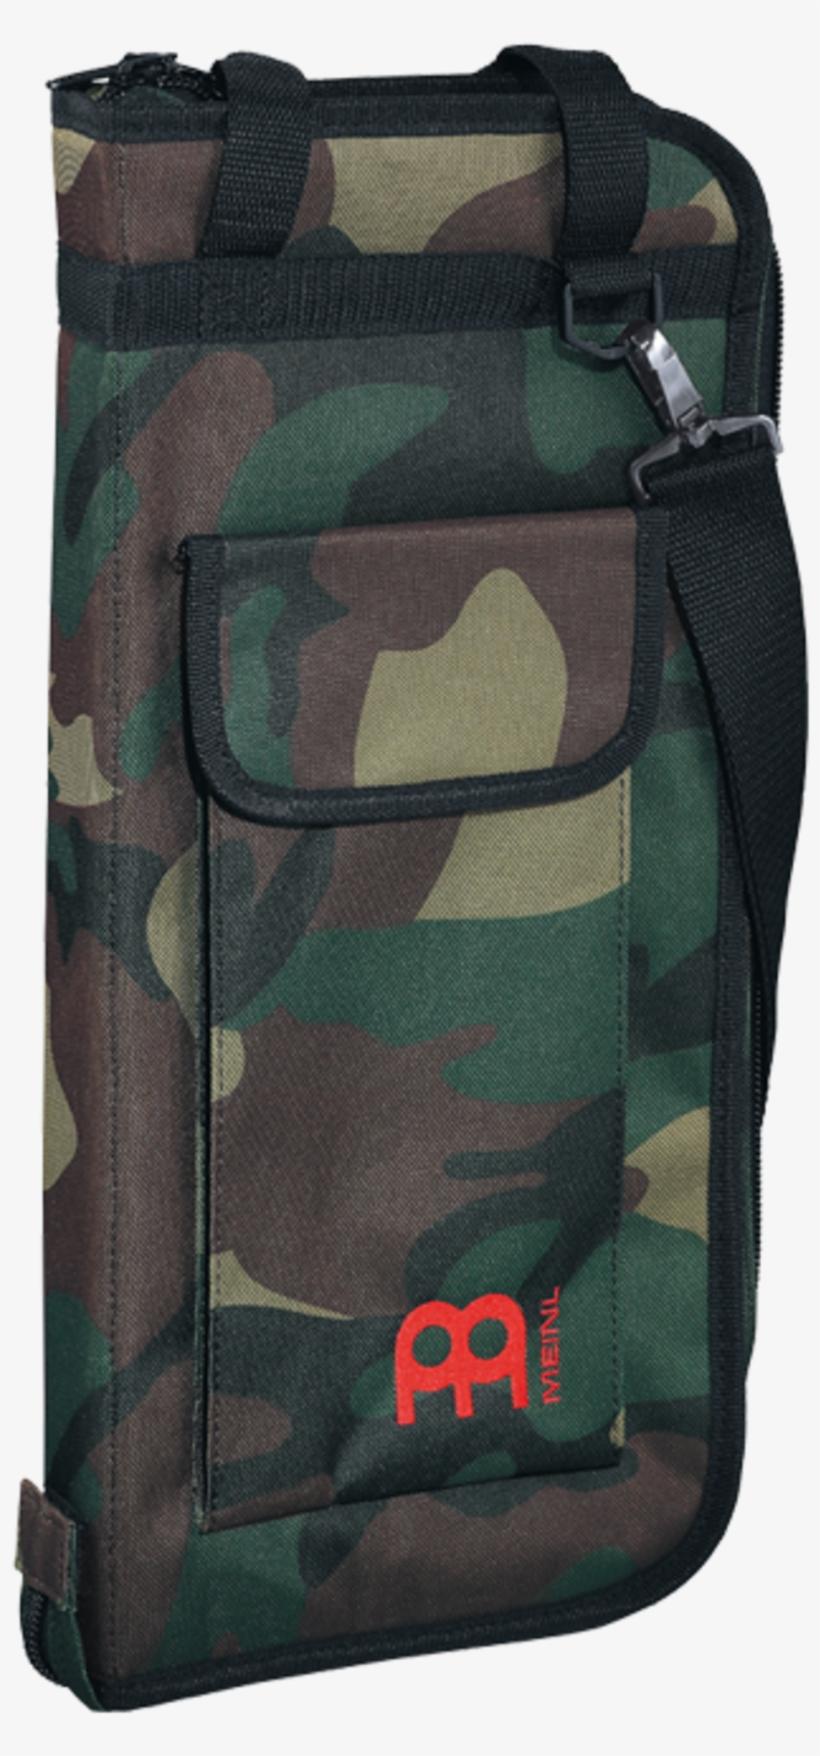 Designer Stick Bag Original Camouflage - Meinl Designer Stick Bag Original Camoflage, transparent png #951236